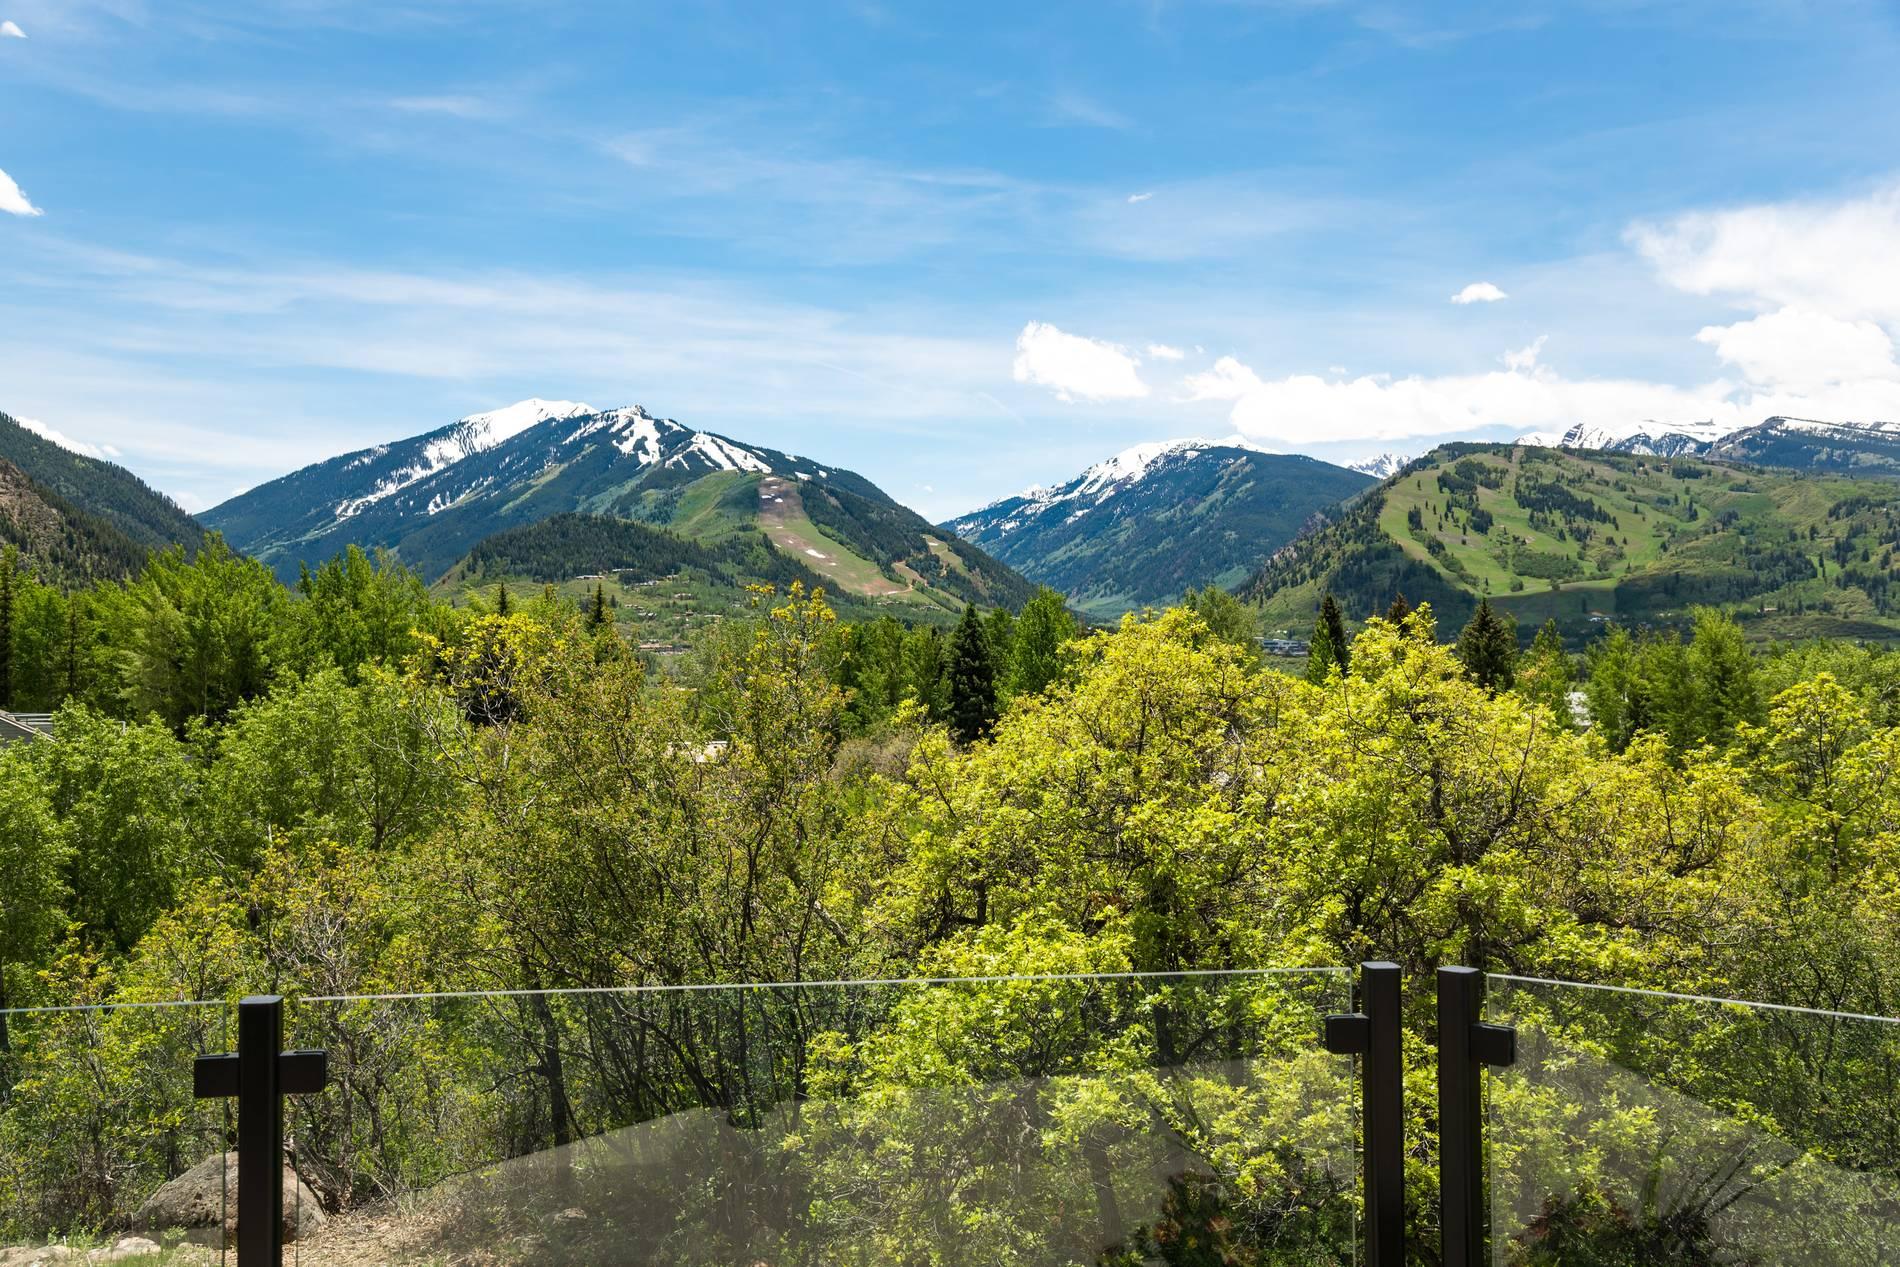 346 Draw Drive Aspen Photo 40